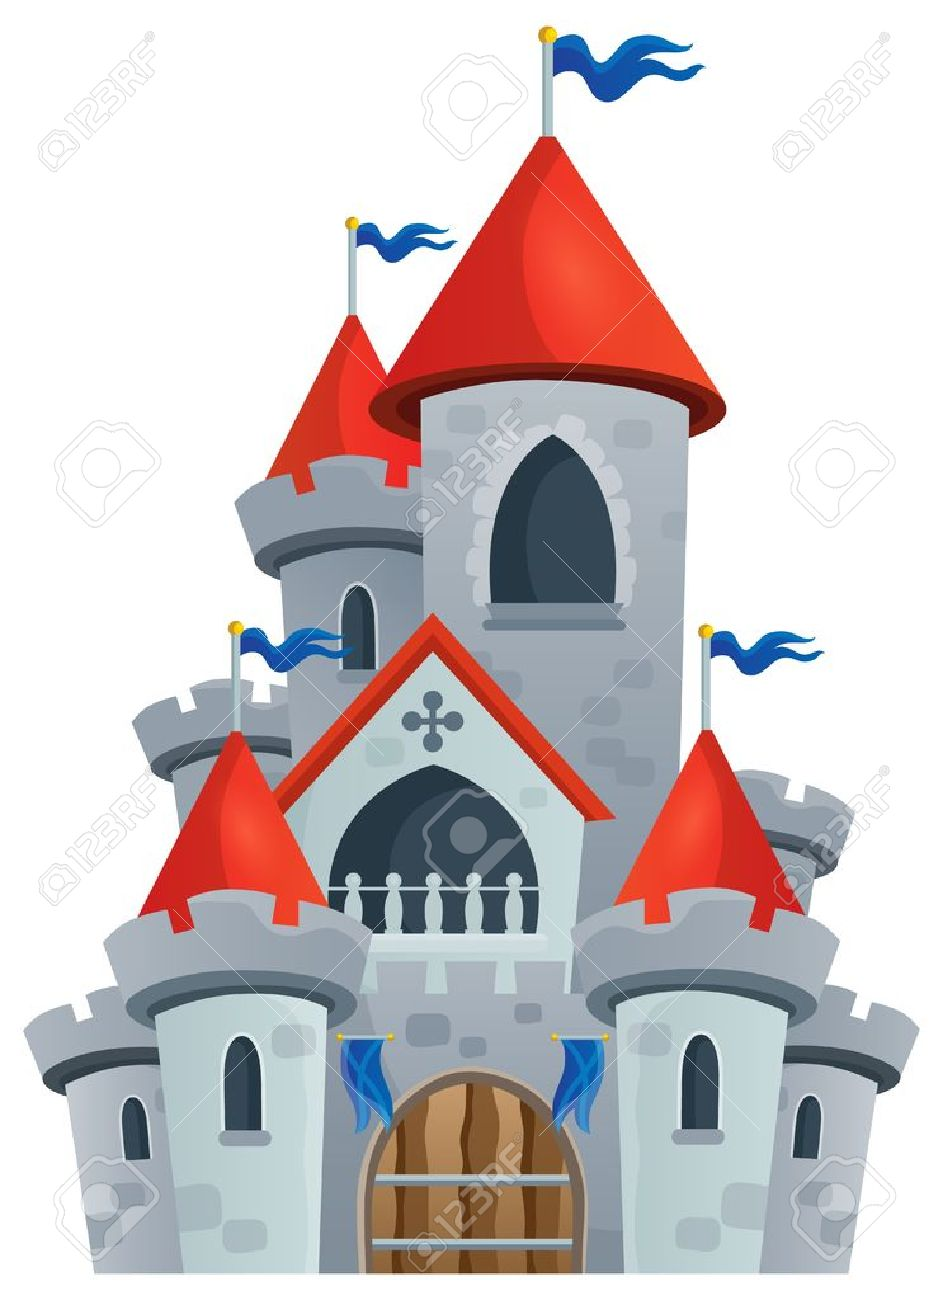 Fairy tale castle theme image Stock Vector - 41377217